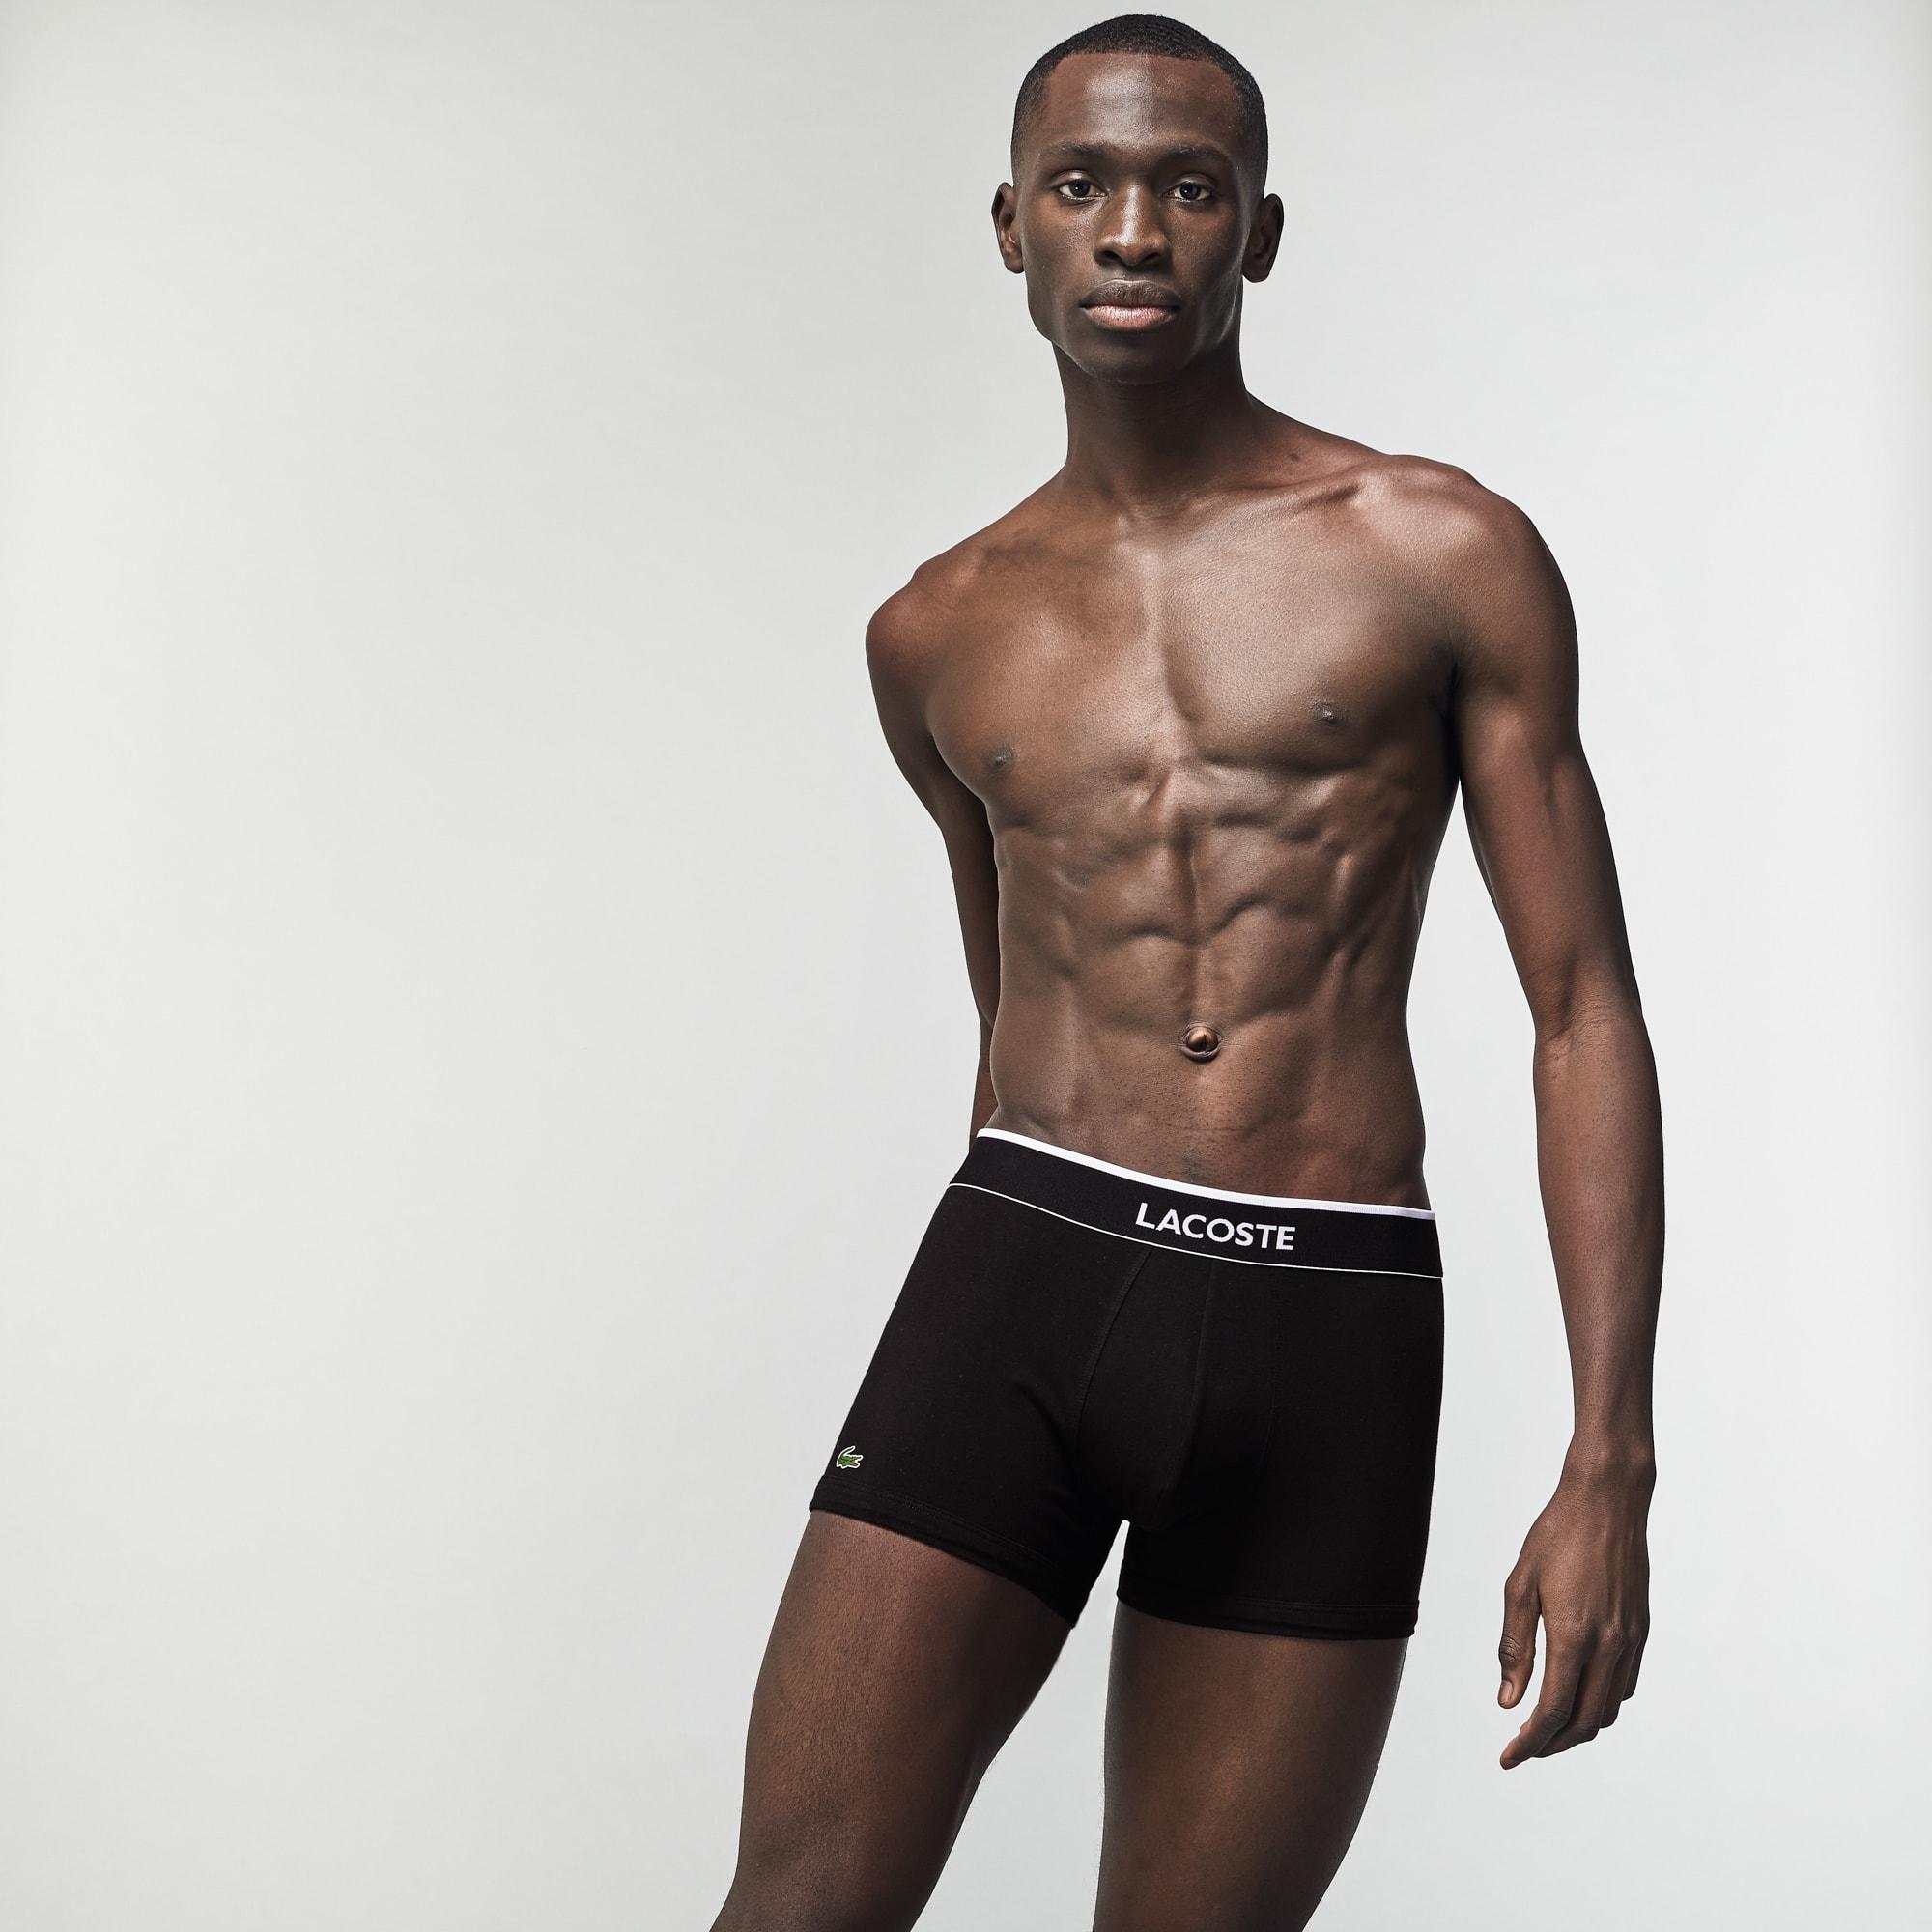 f59750a8 Men's Boxers and Briefs | Underwear | LACOSTE